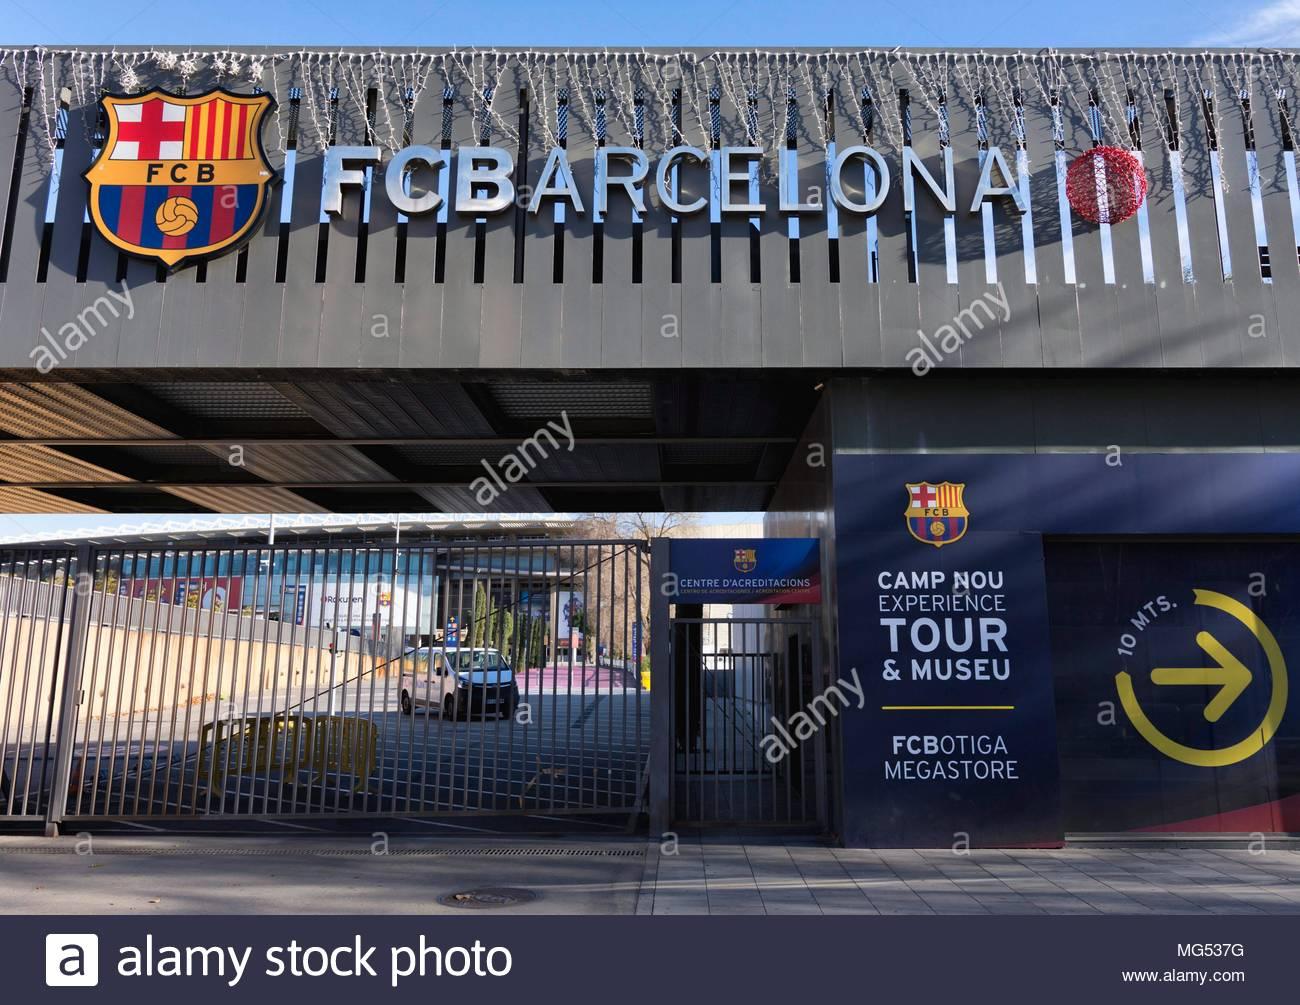 FC Barcelona - Stock Image